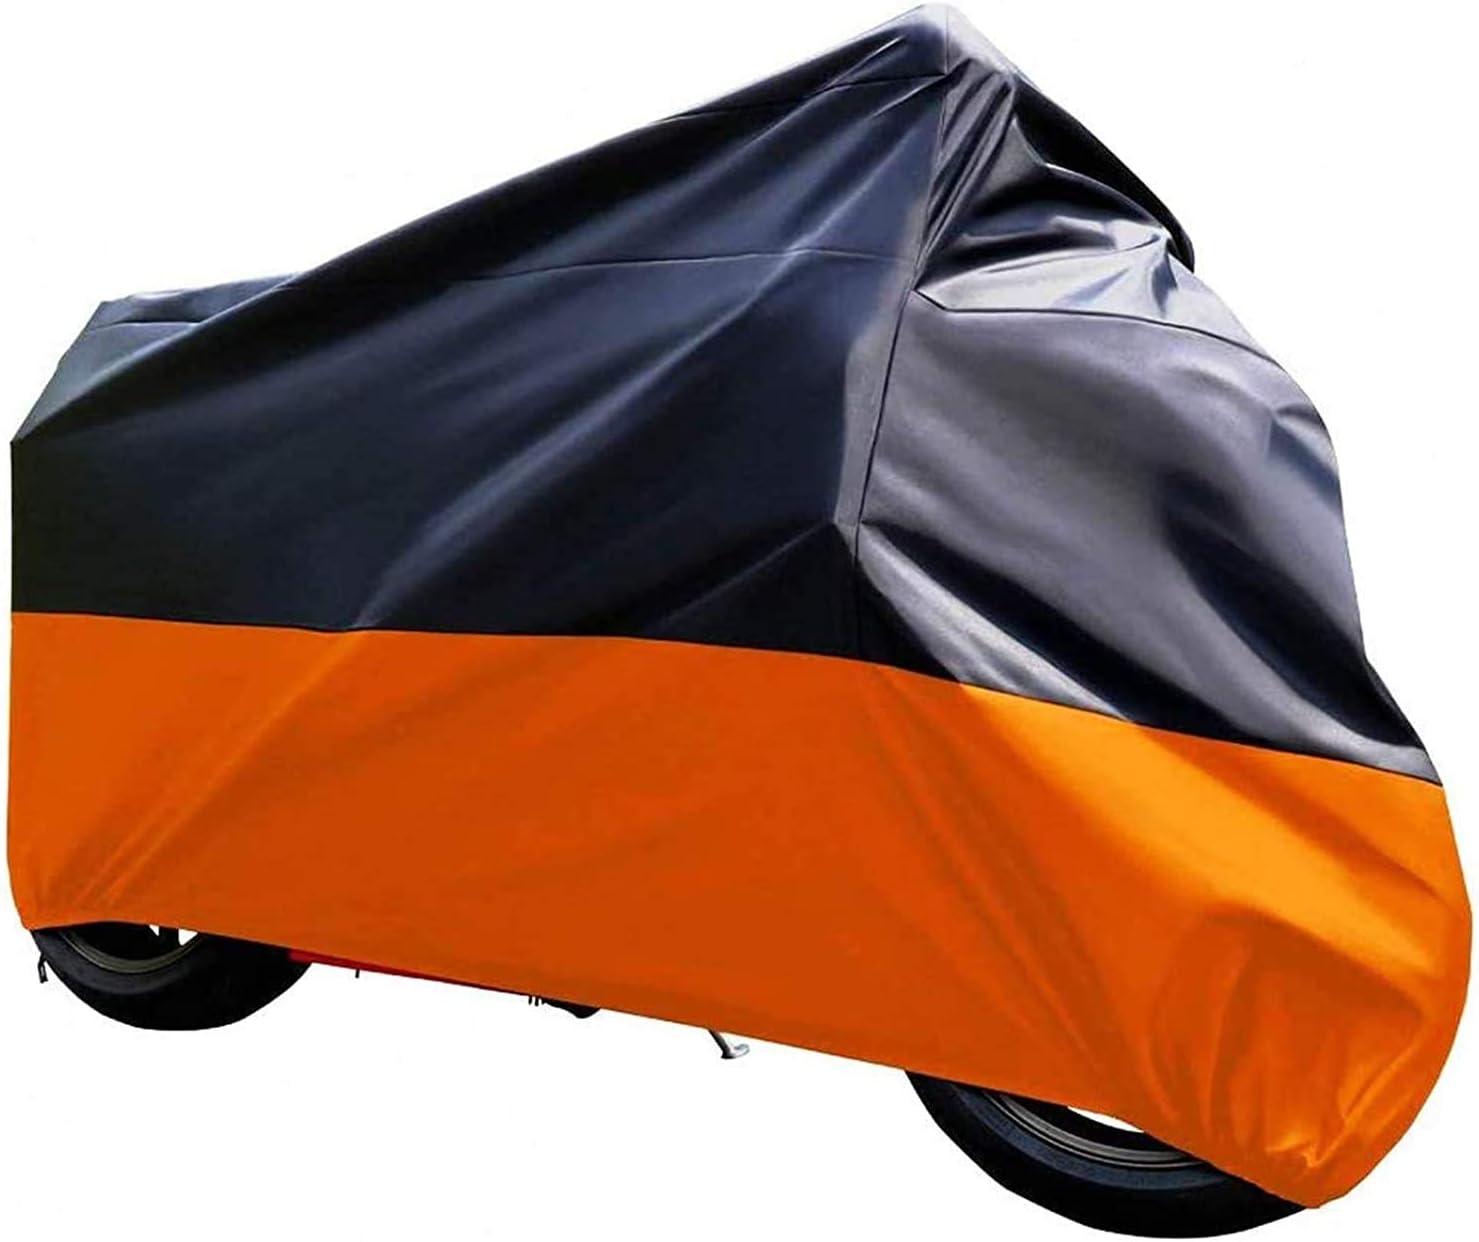 Tokept Black and Orange Waterproof Sun Motorcycle cover (XXL).116